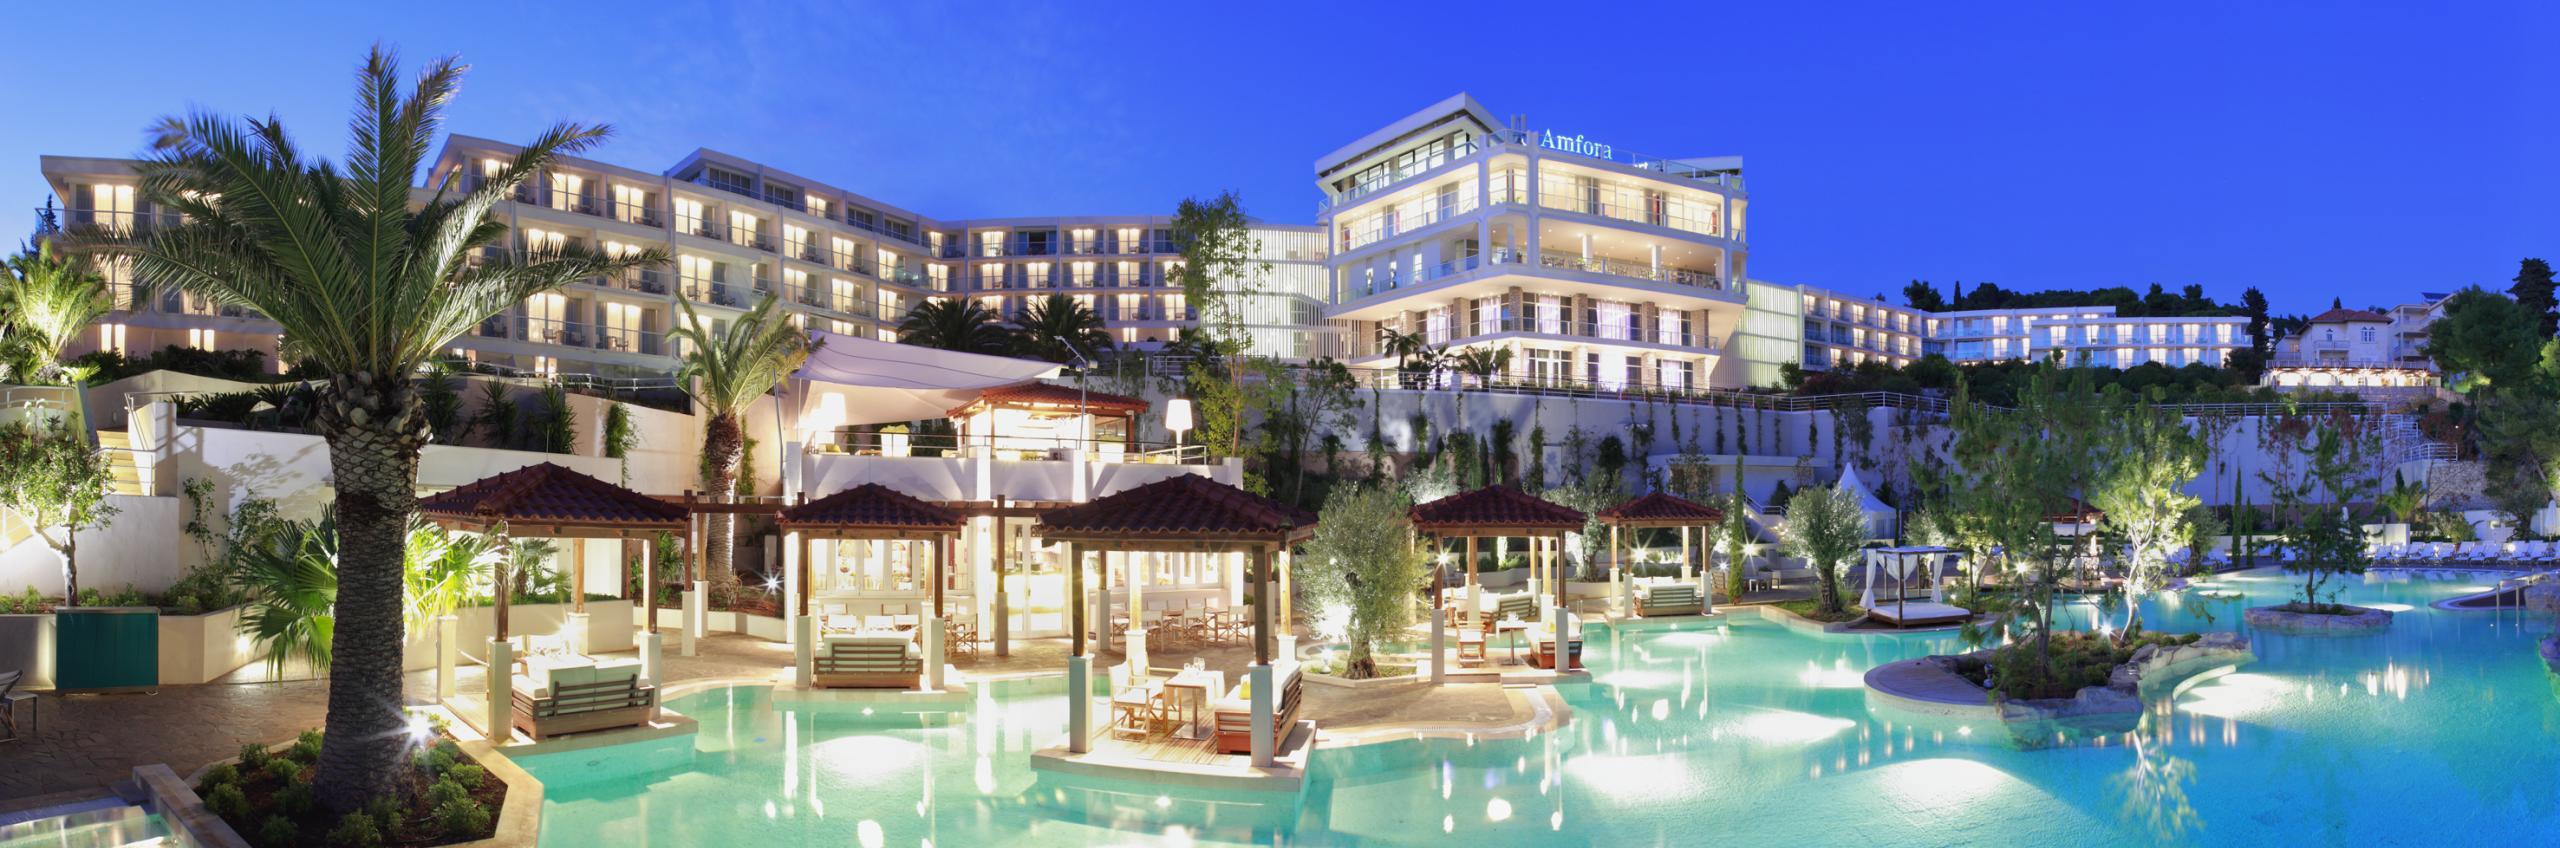 Amfora, grand beach resort- Hvar's #1 conference hotel